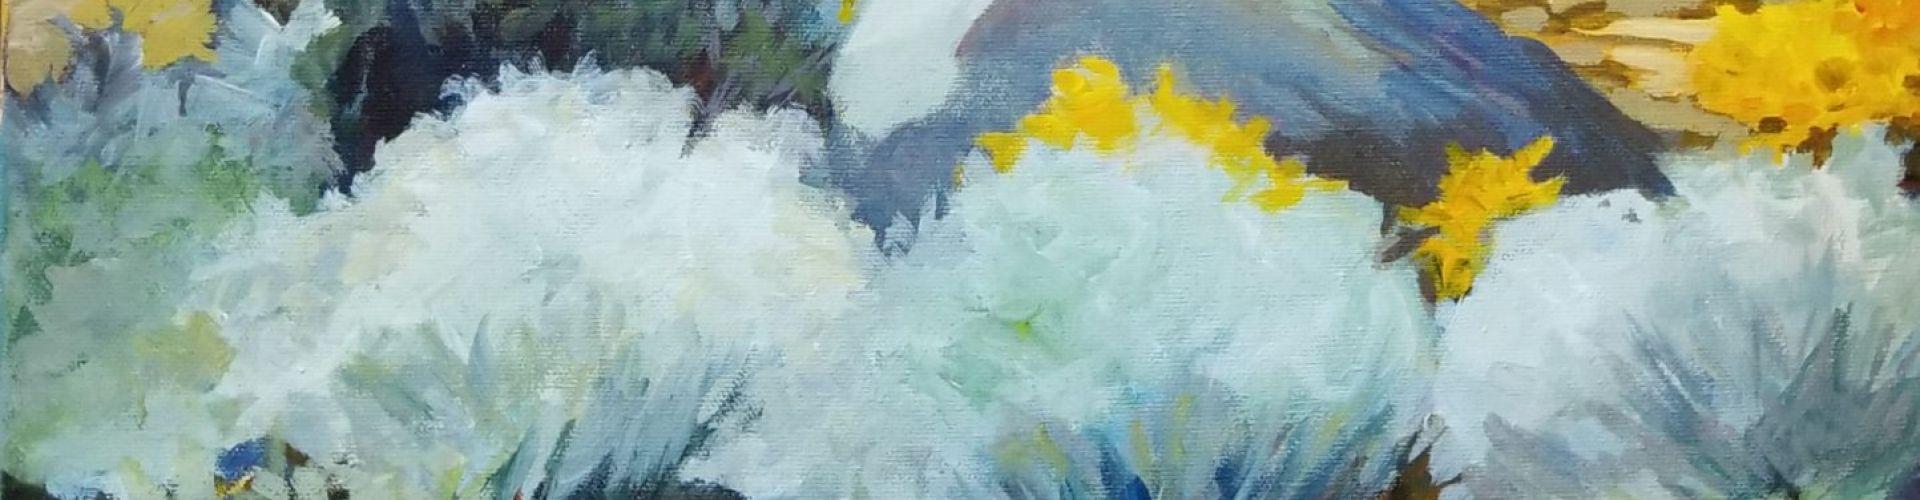 Sage Brush painting by Linda Lovisa